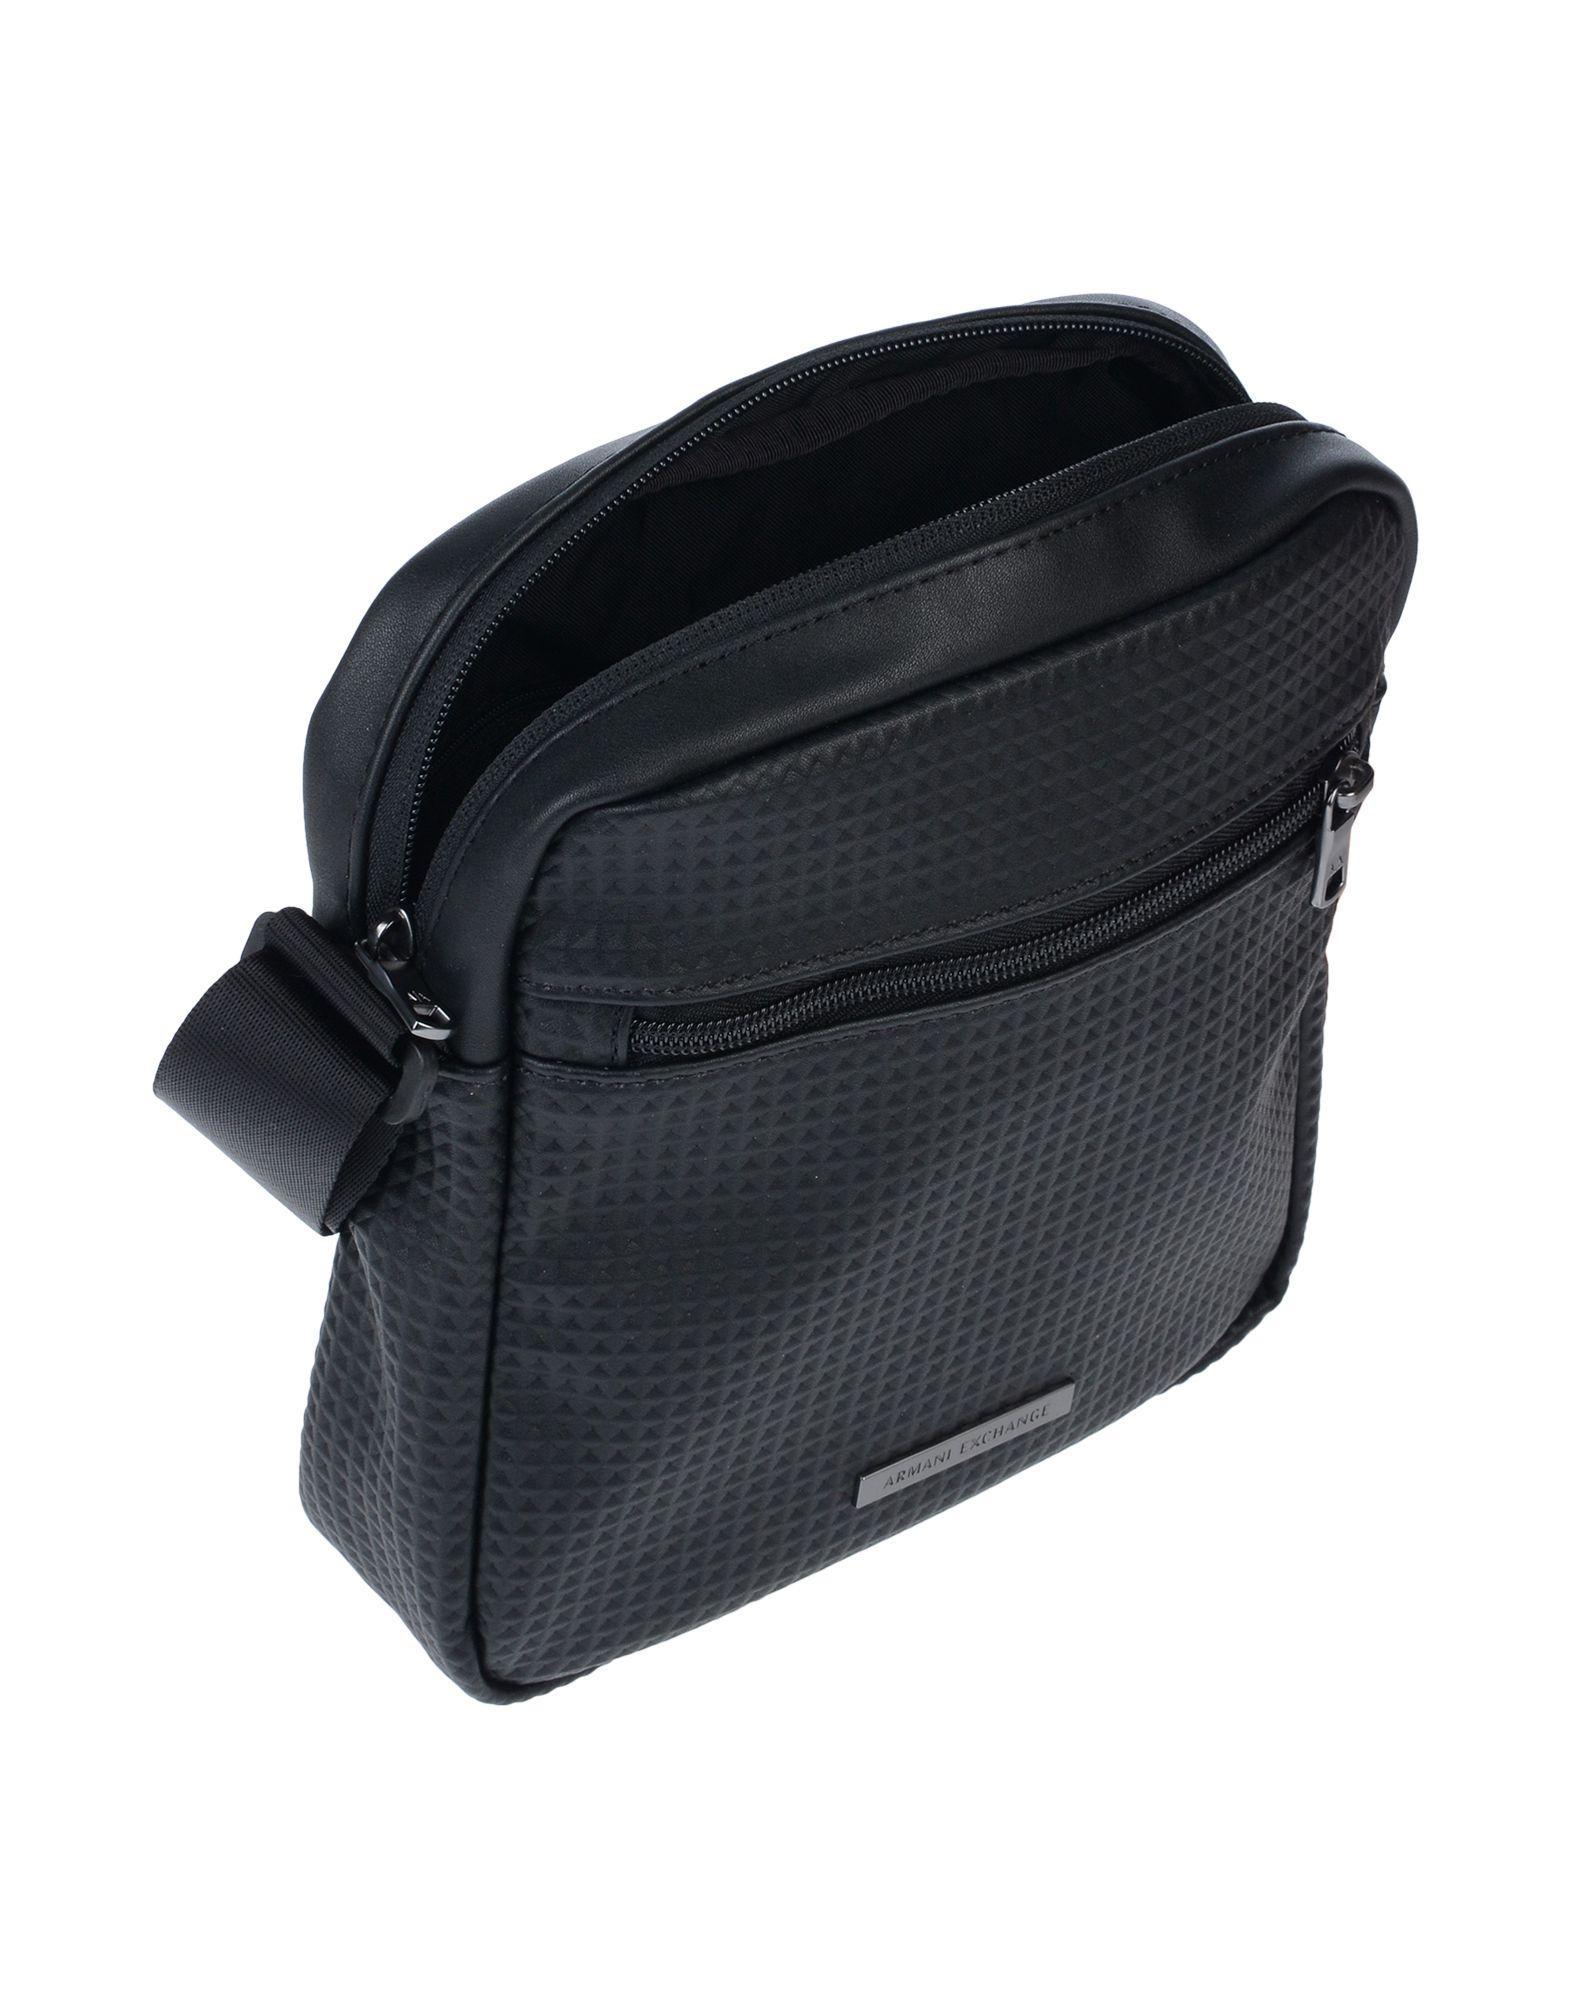 8f612c8c8547 Armani Exchange Cross-body Bag in Black for Men - Lyst